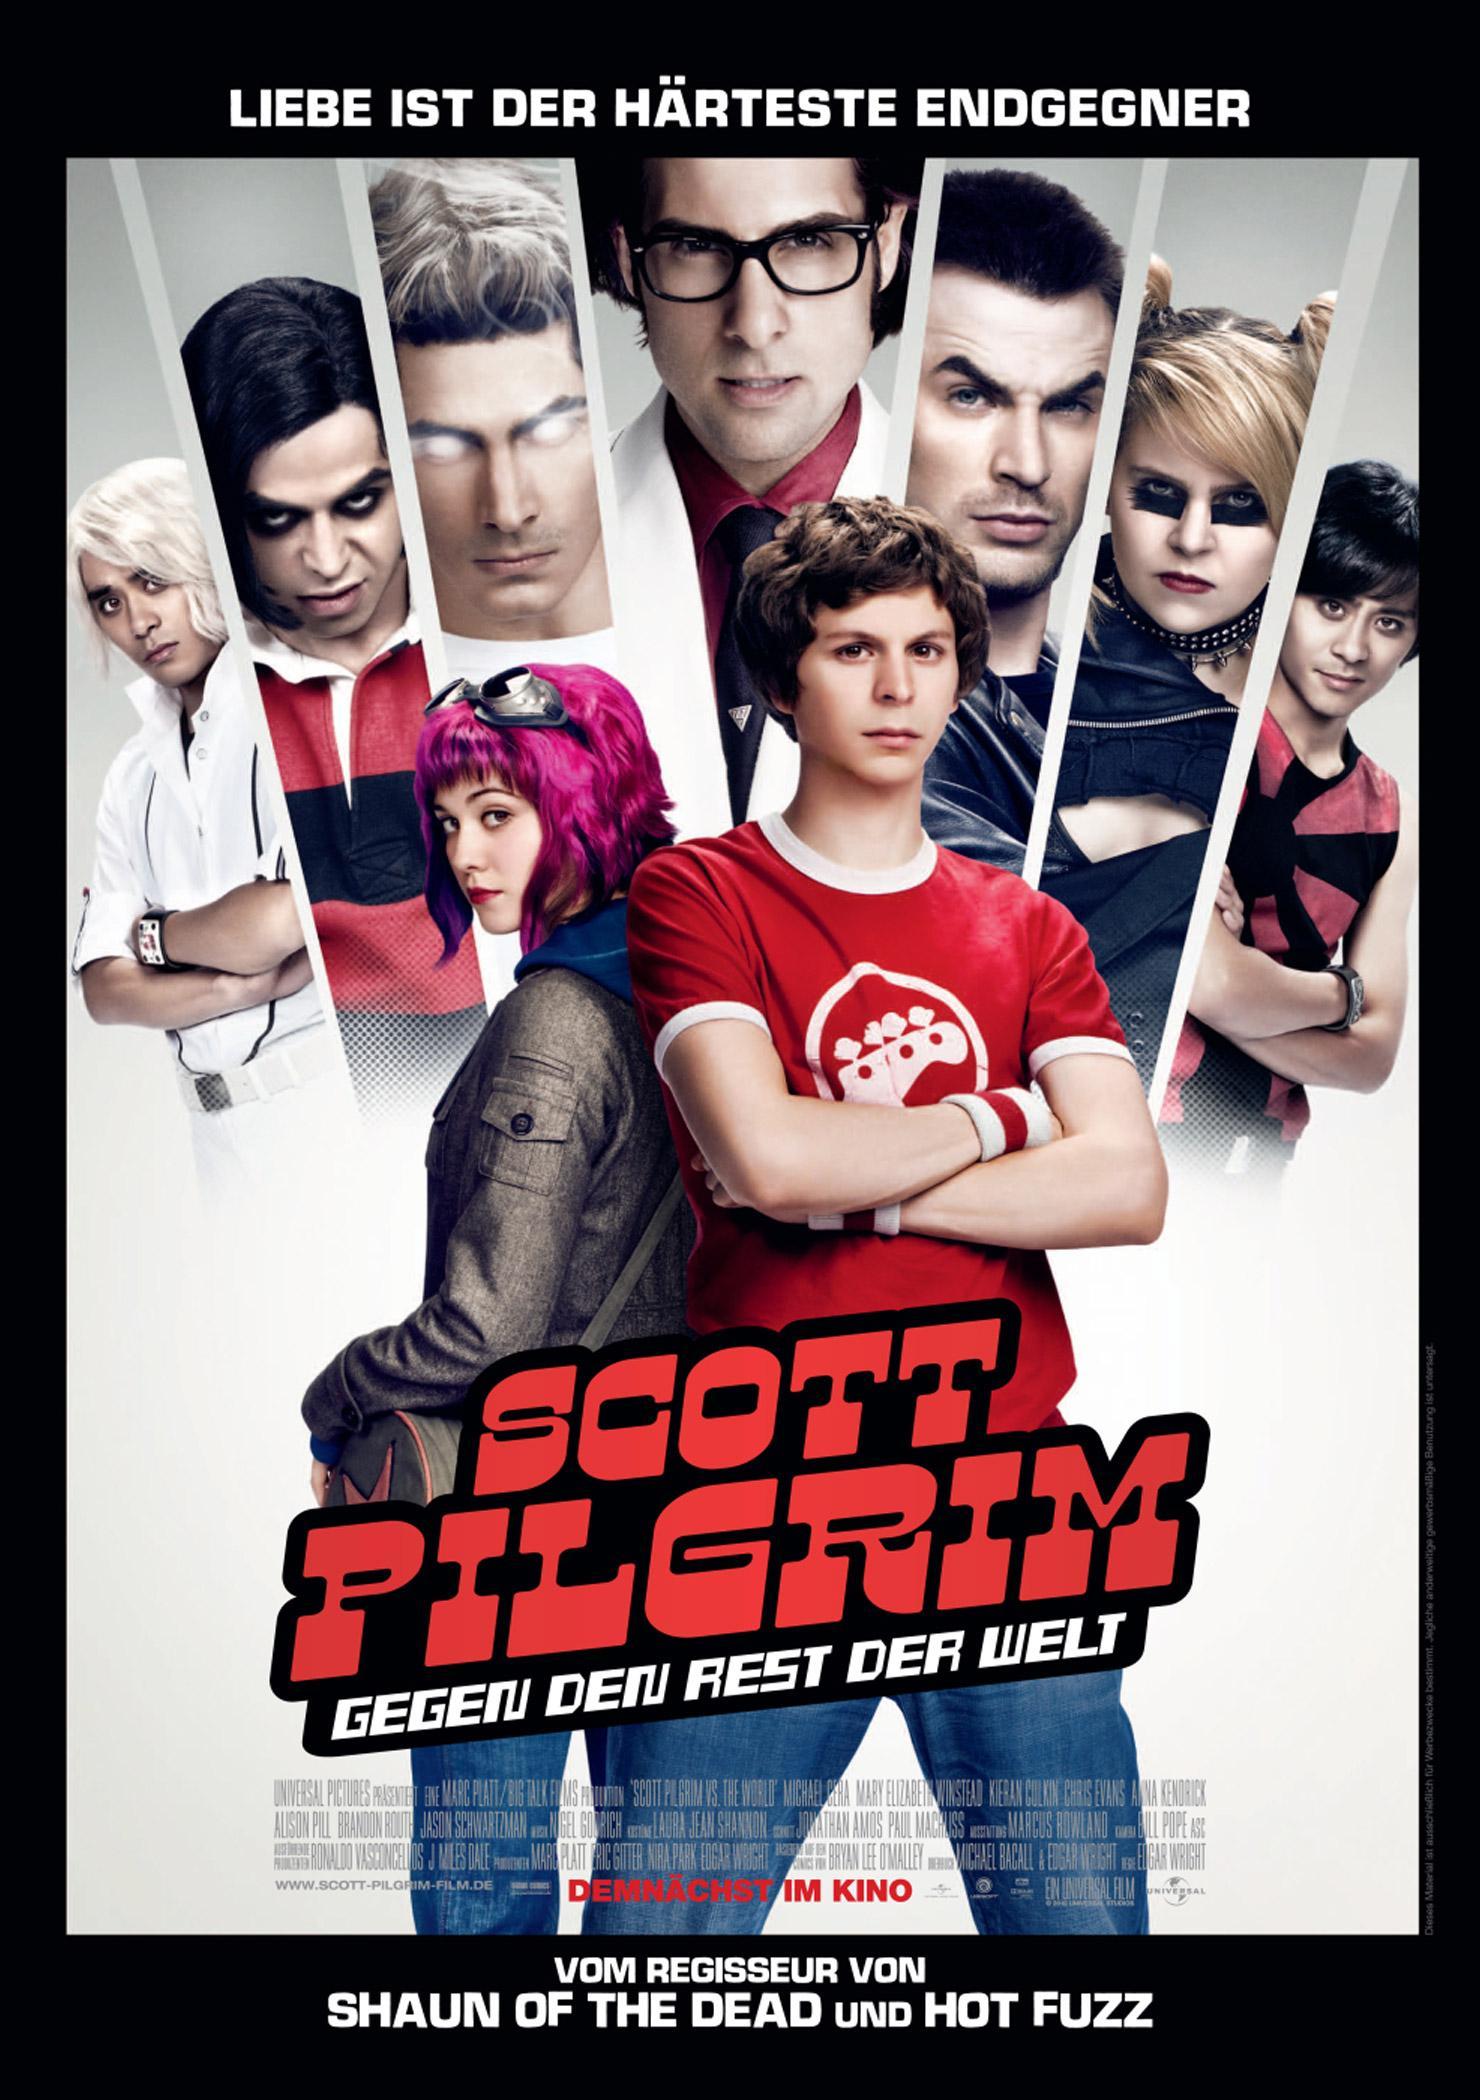 Scott Pilgrim gegen den Rest der Welt (Poster)